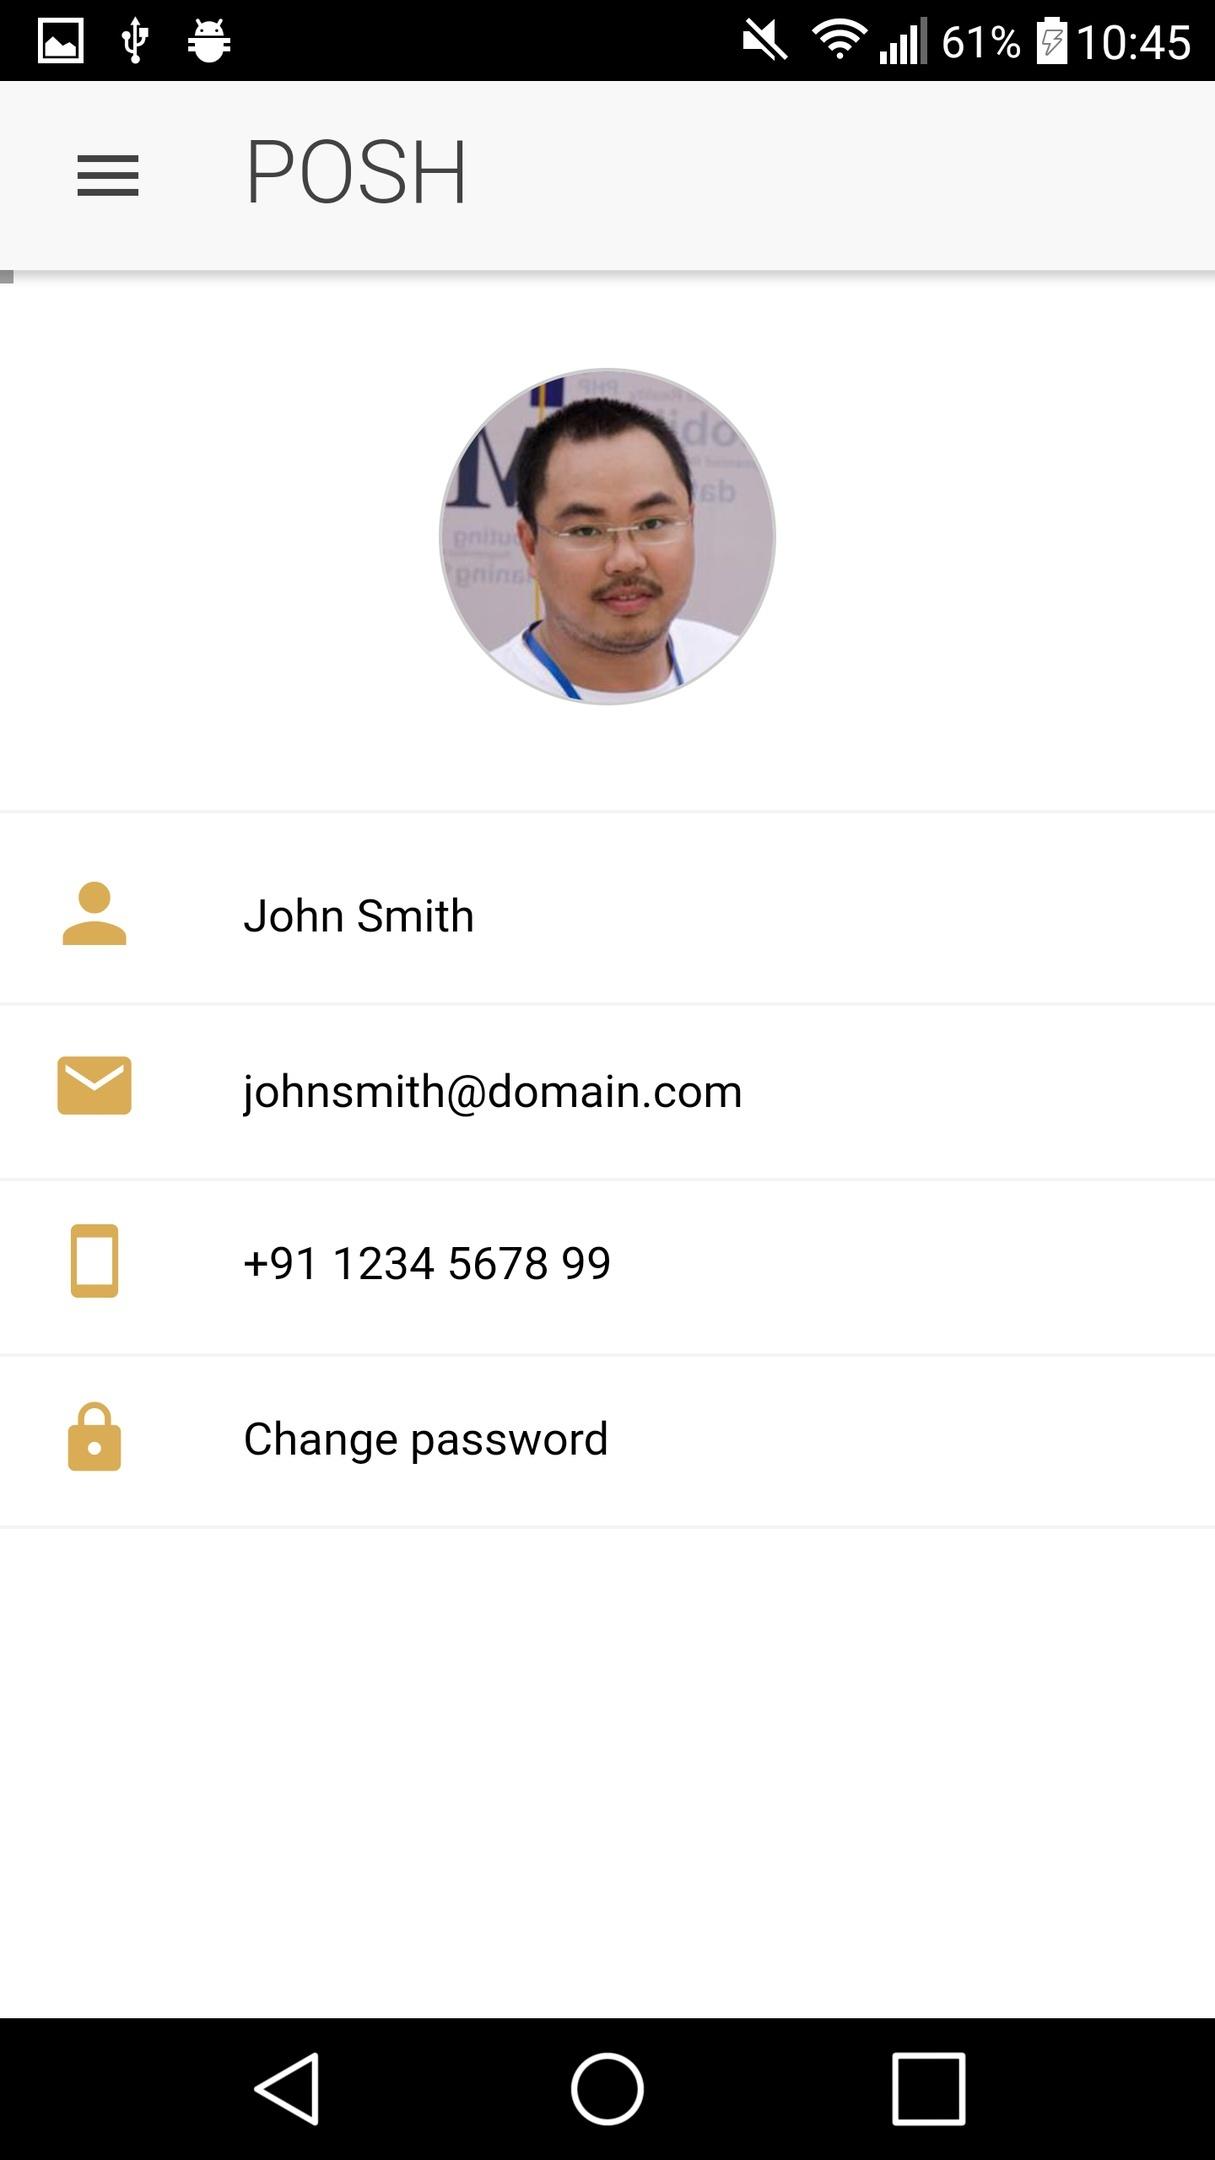 ionFullApp Ecommerce App 9Beauty POSH